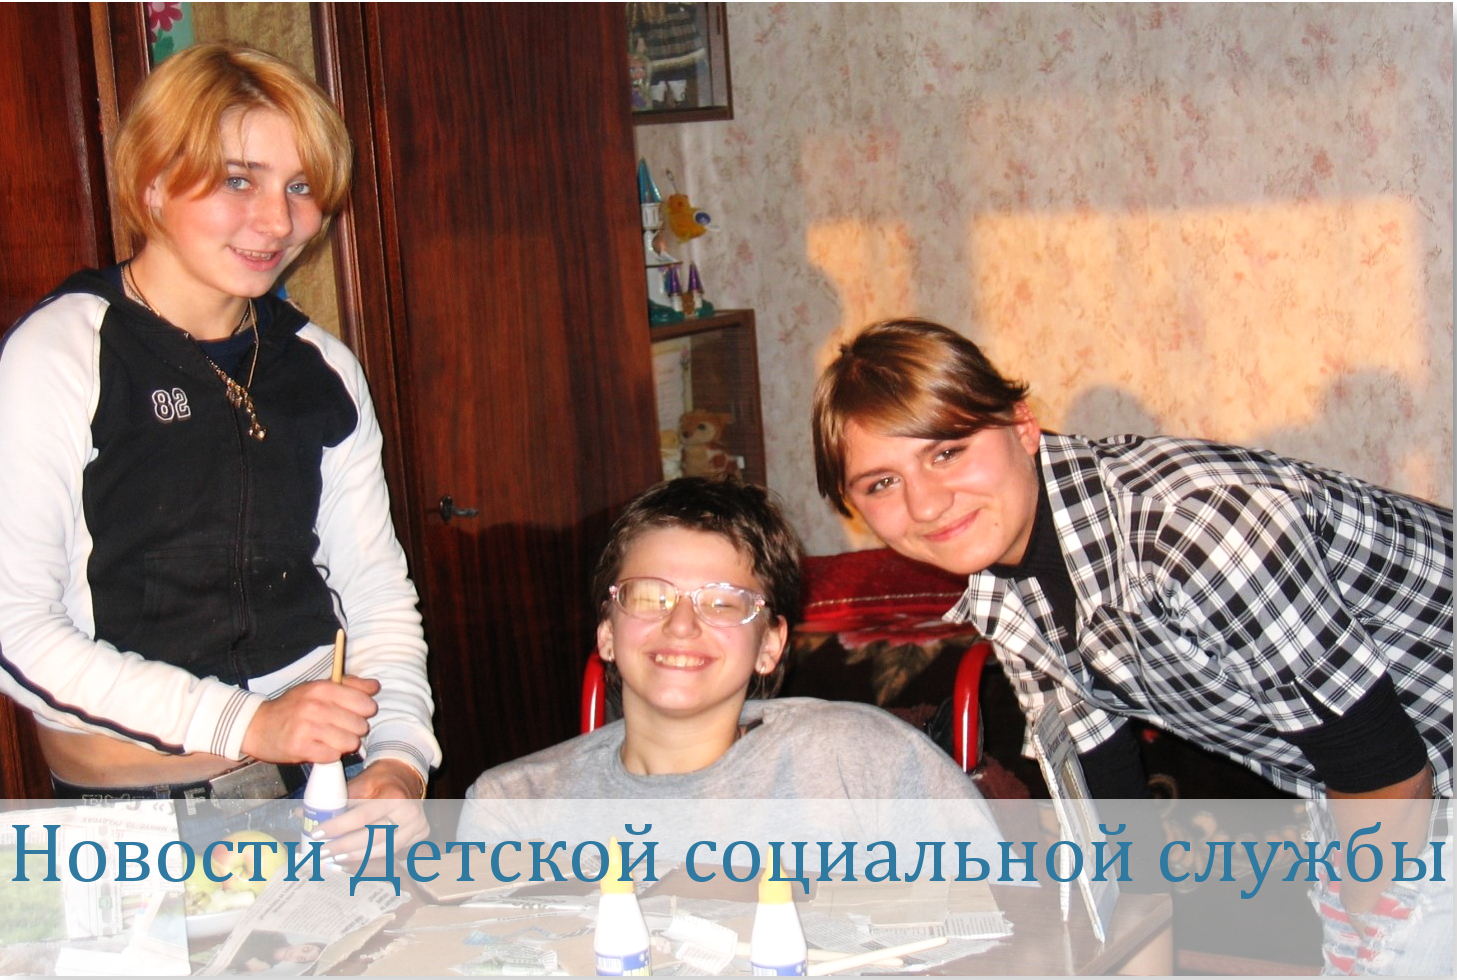 http://rooidom.ru/wp-content/uploads/2017/03/Рисунок5.jpg